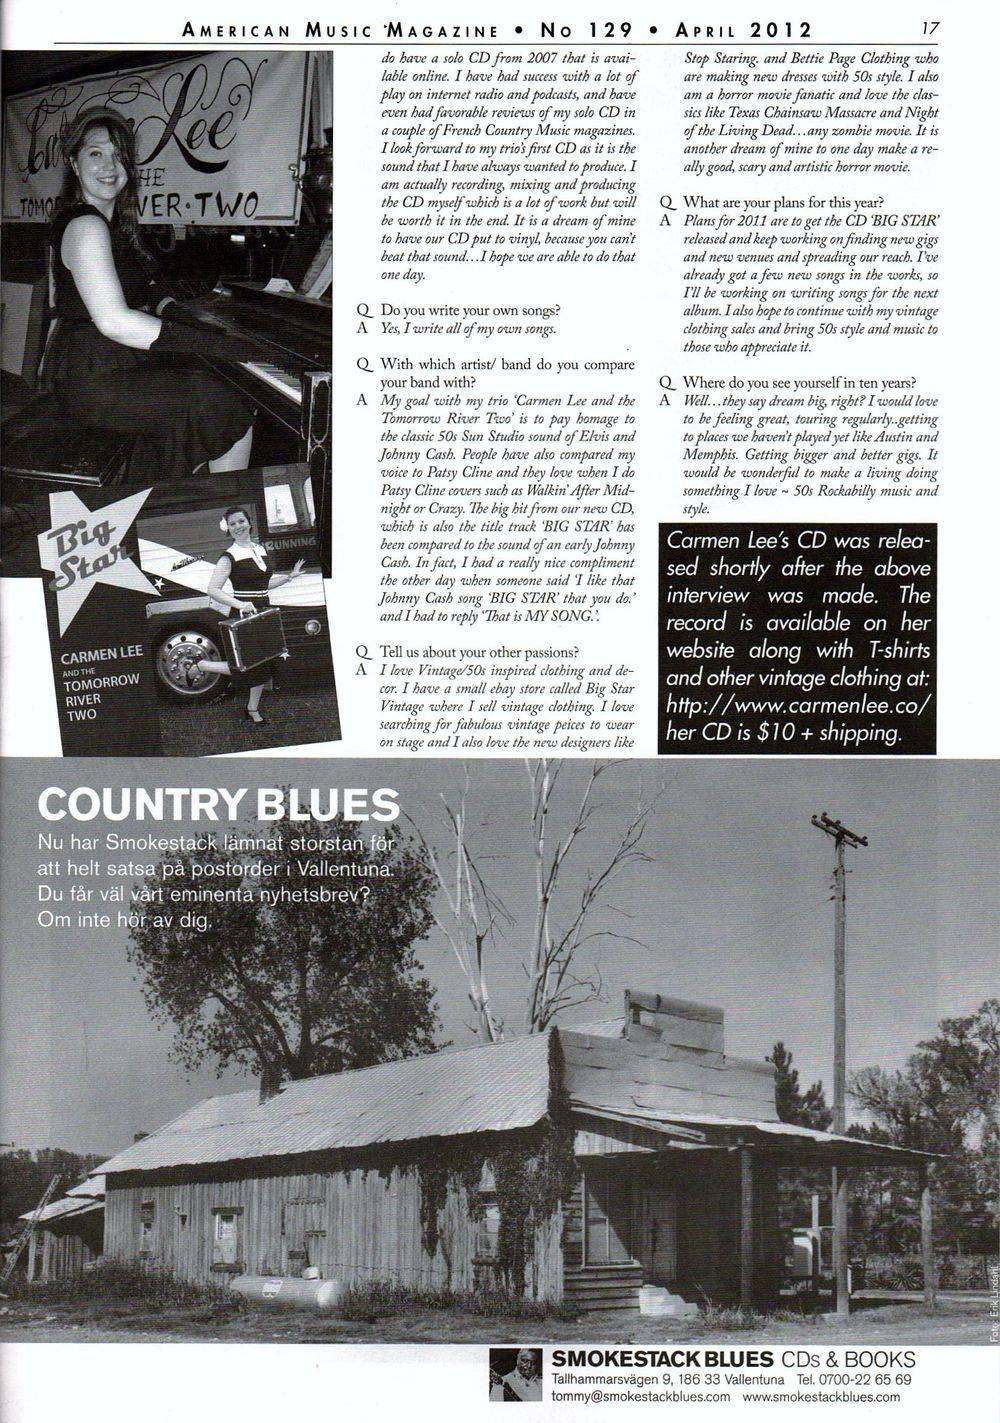 American Music Magazine April 2012